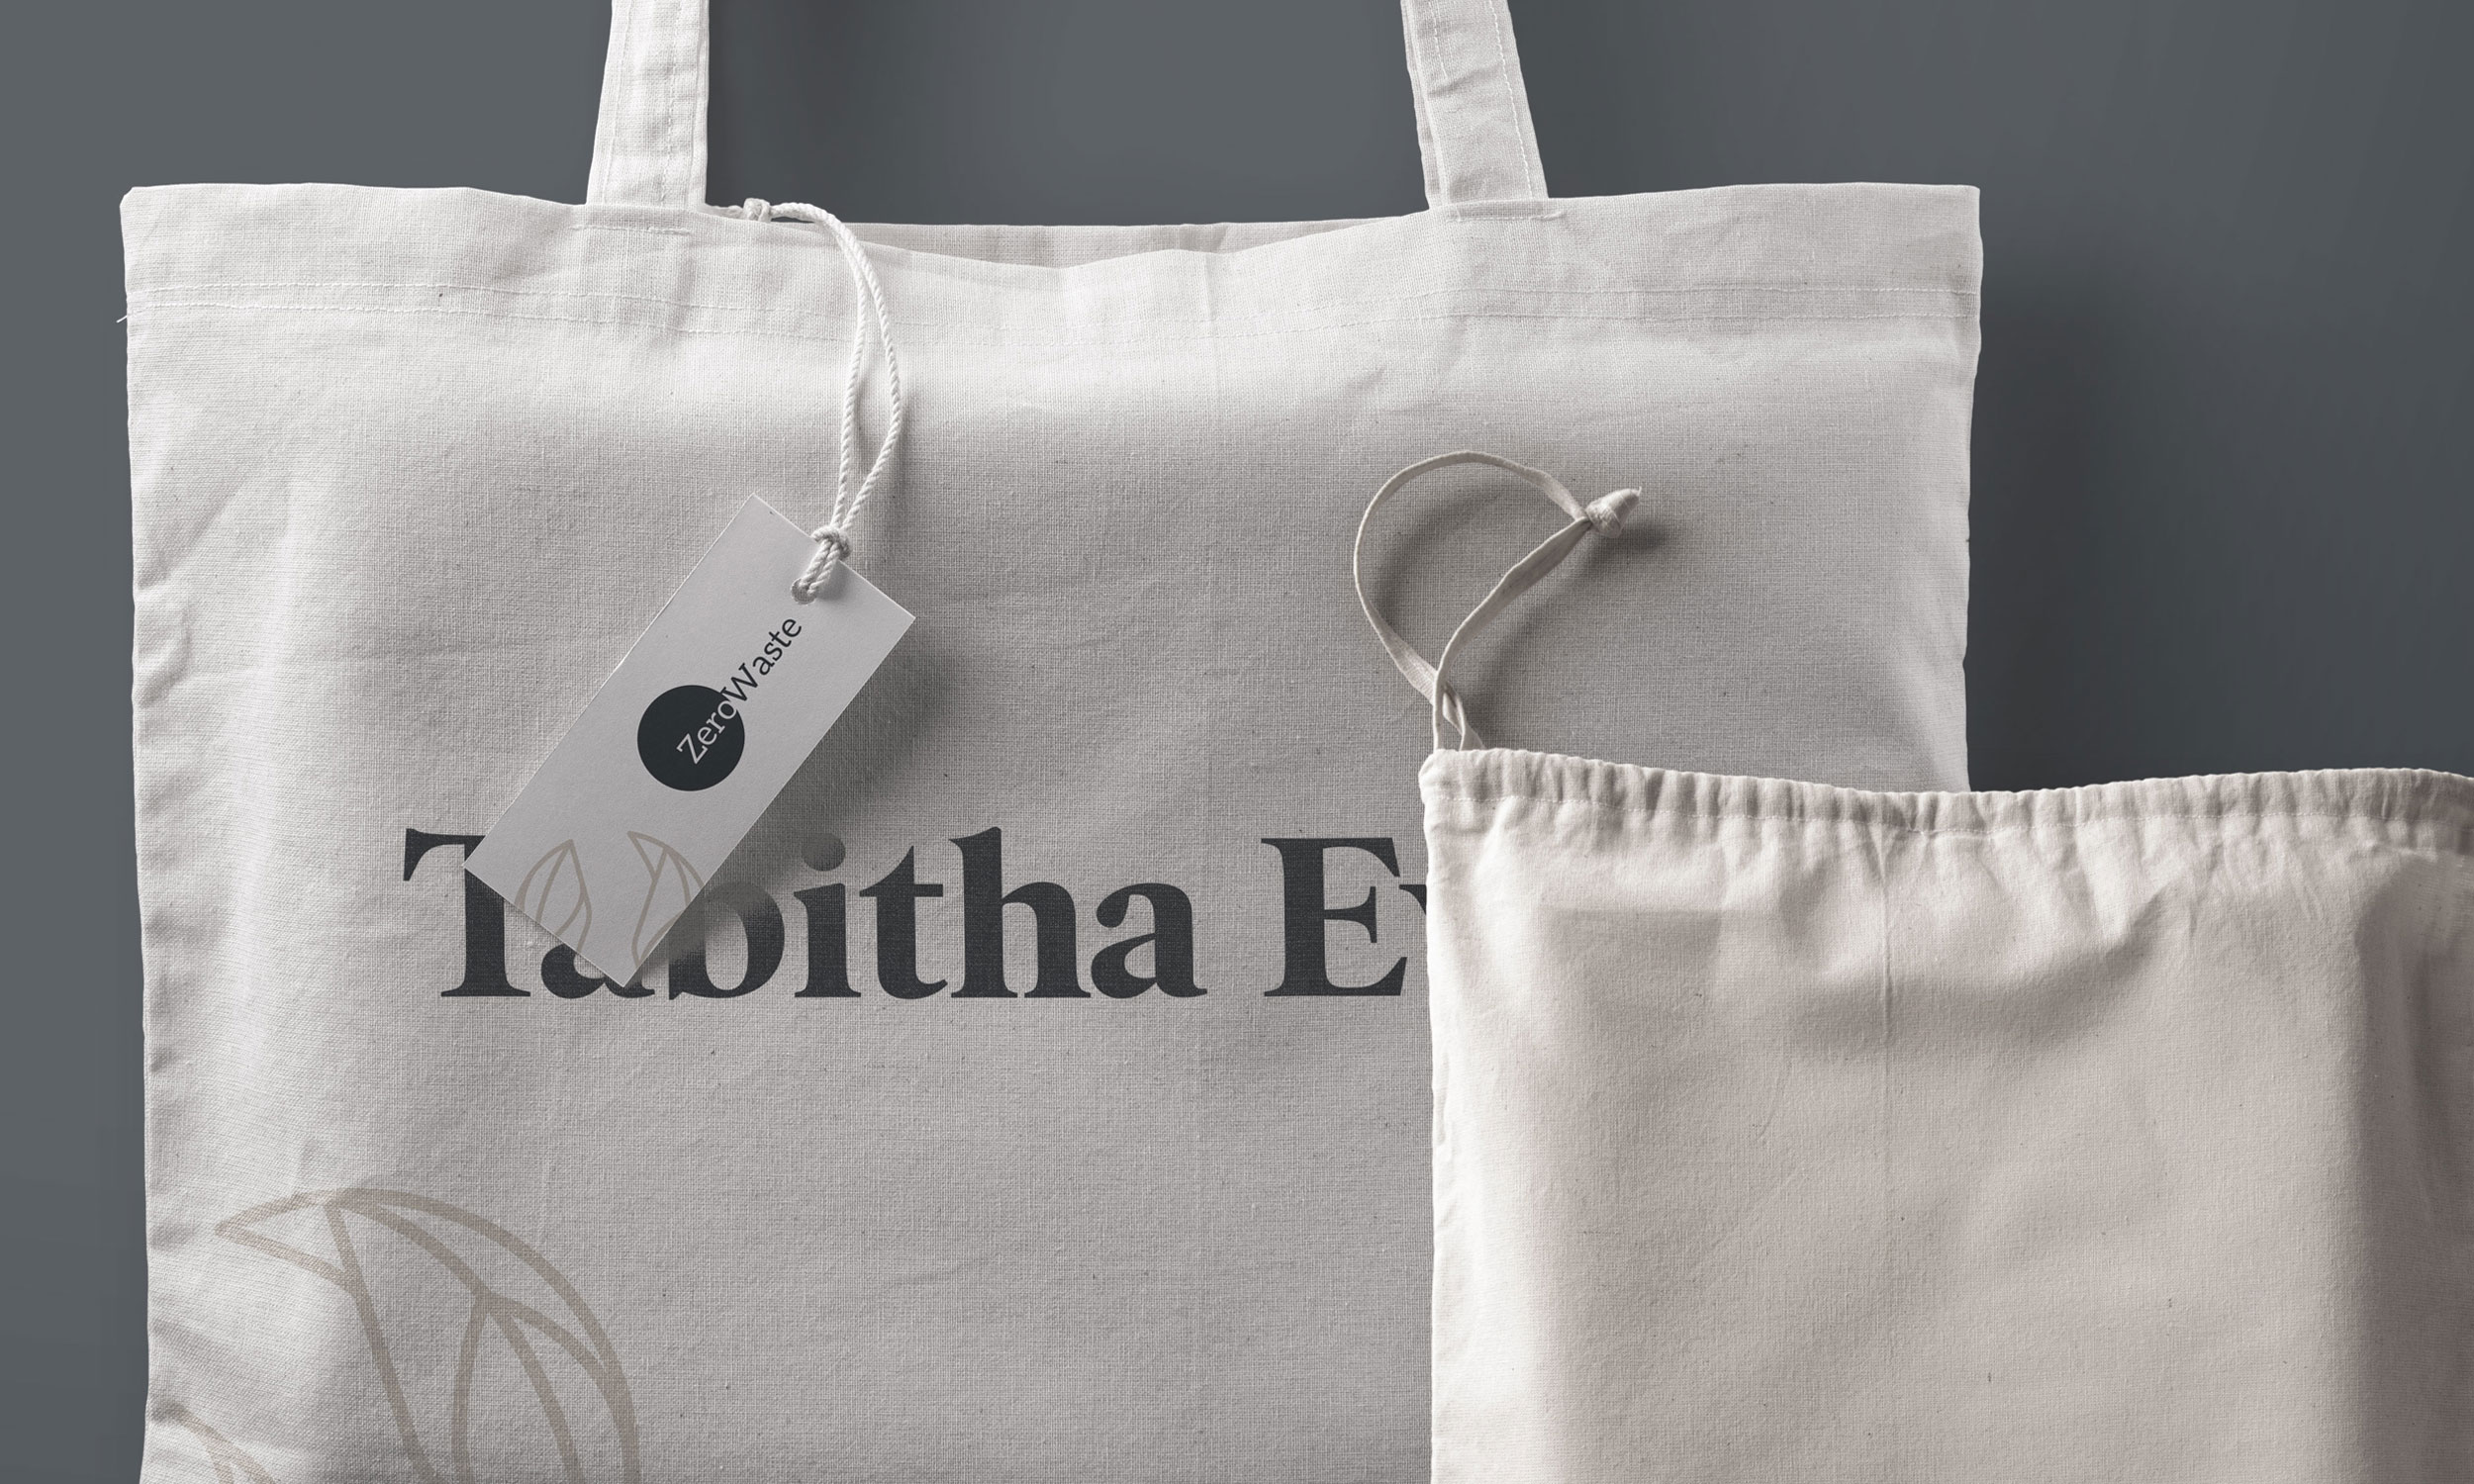 Tabitha Eve Brand Design